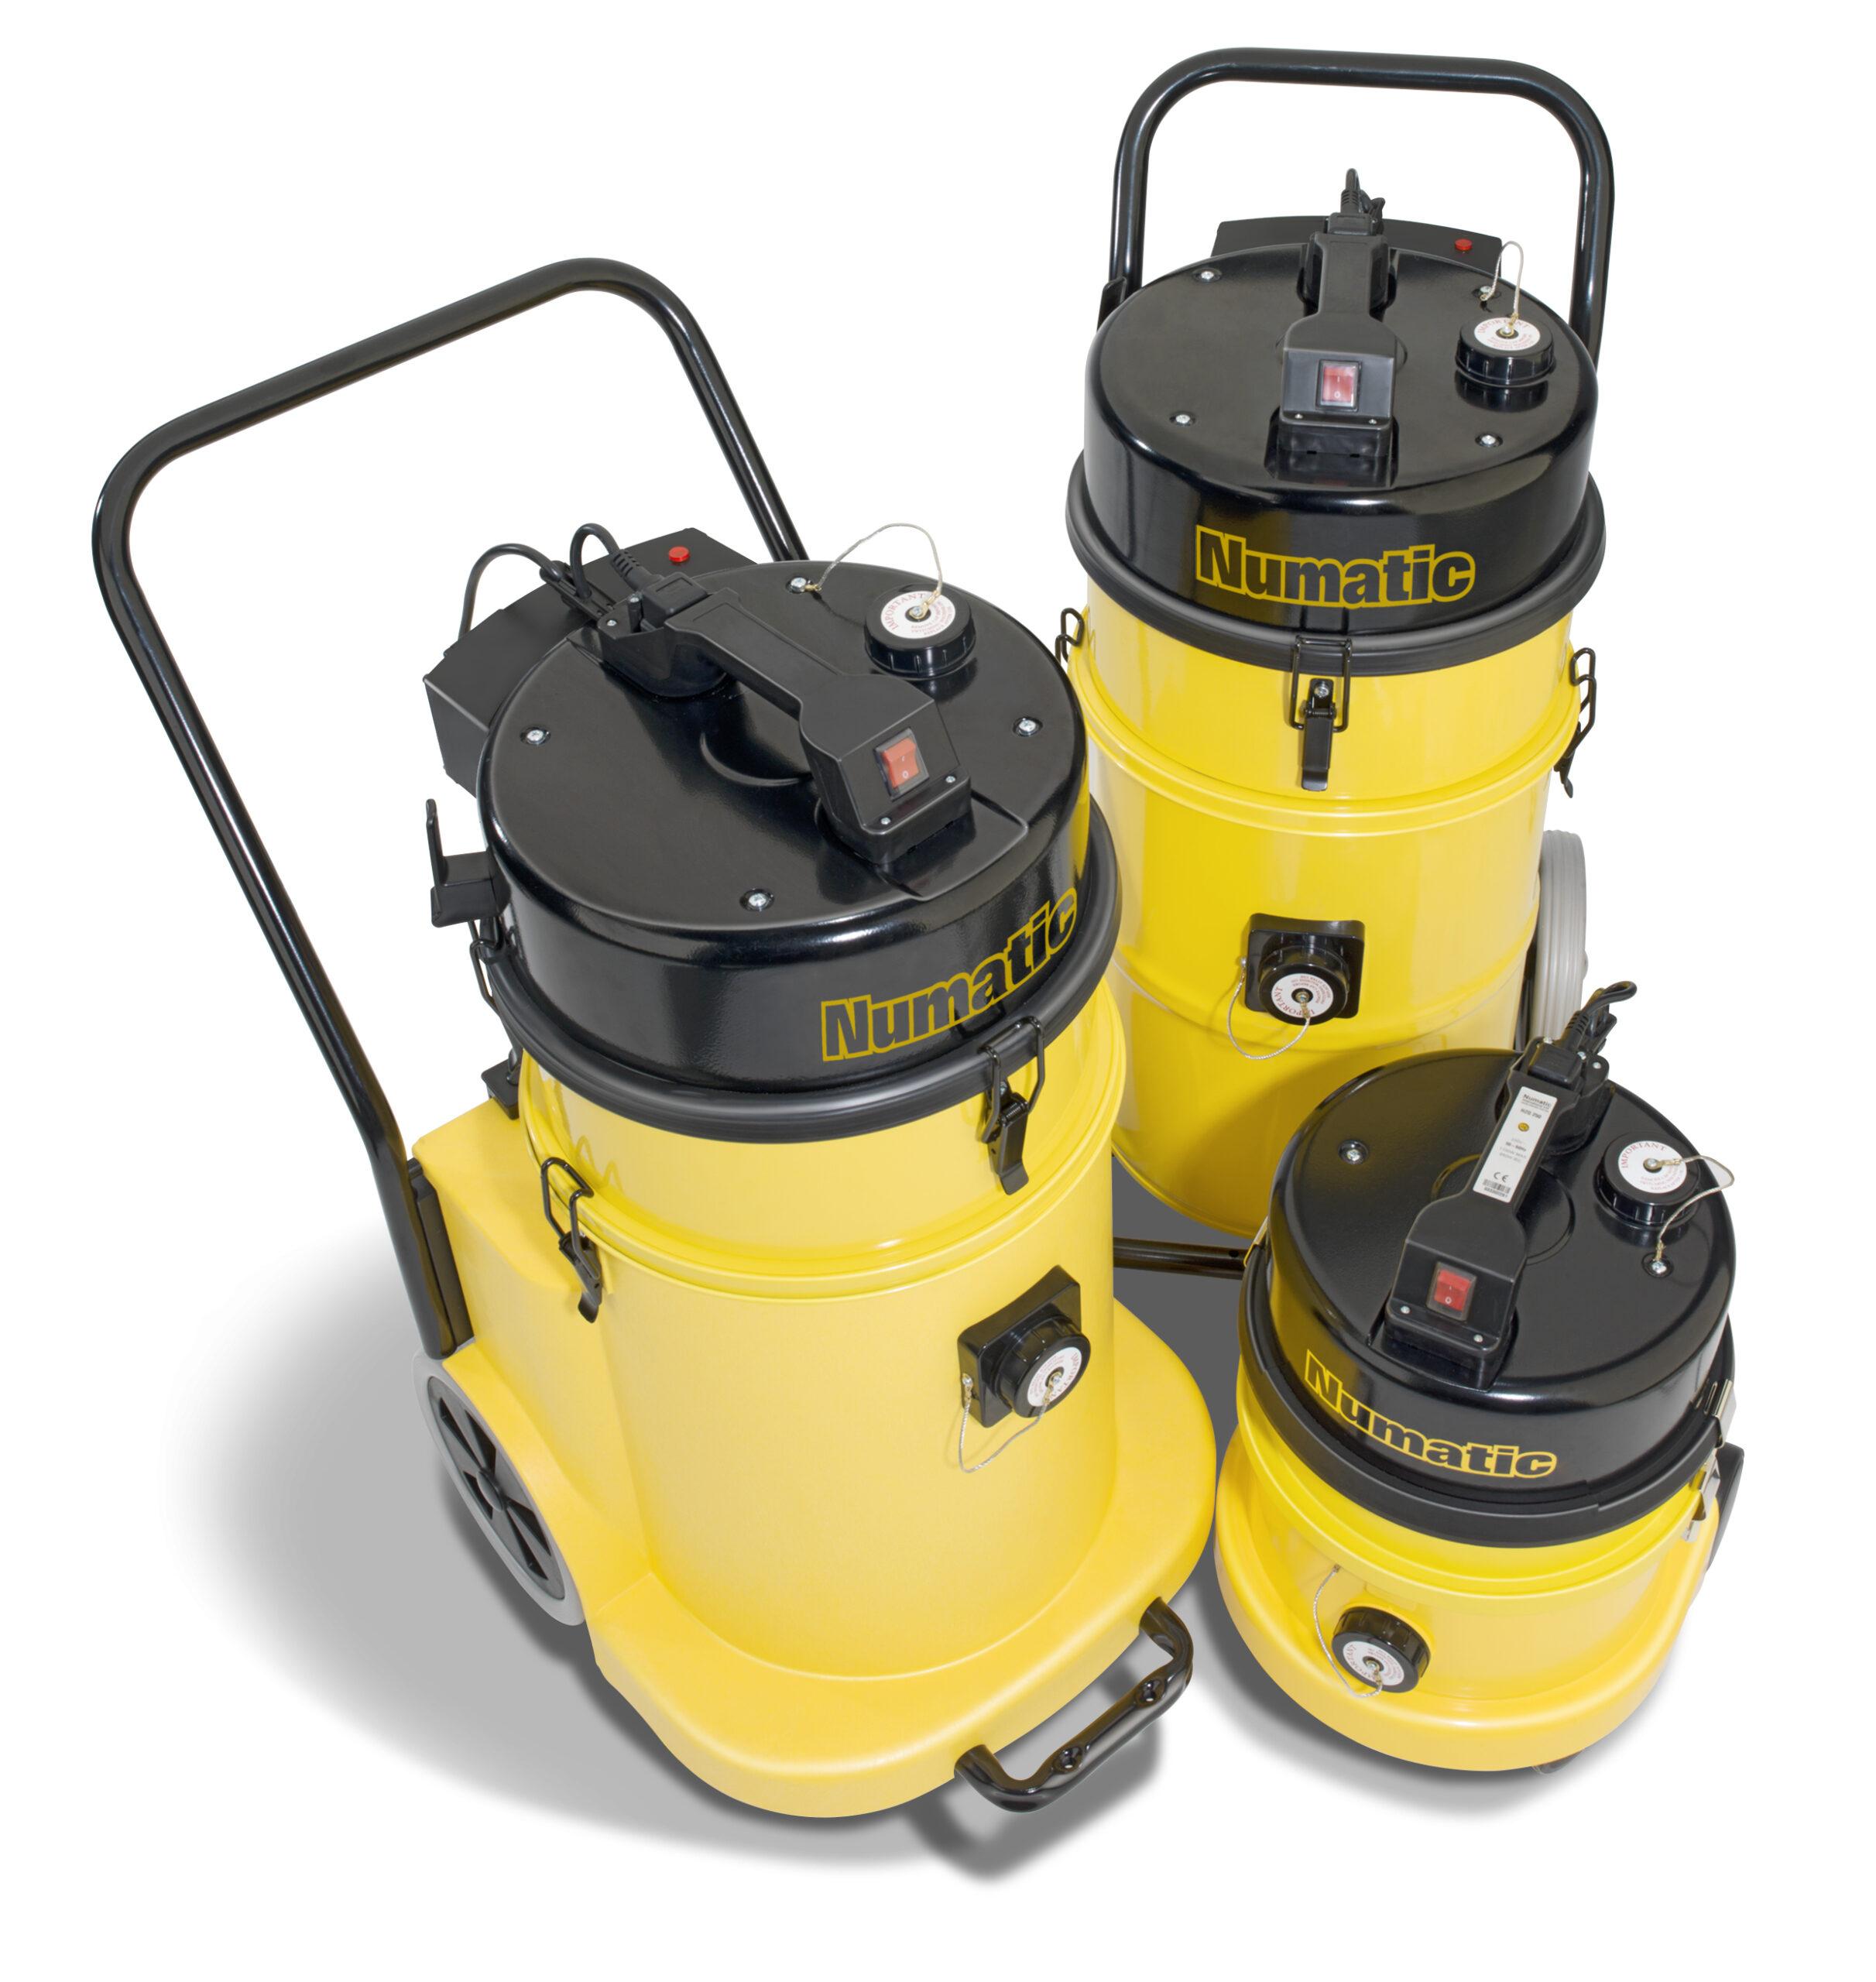 Numatic Hazardous Vacuums